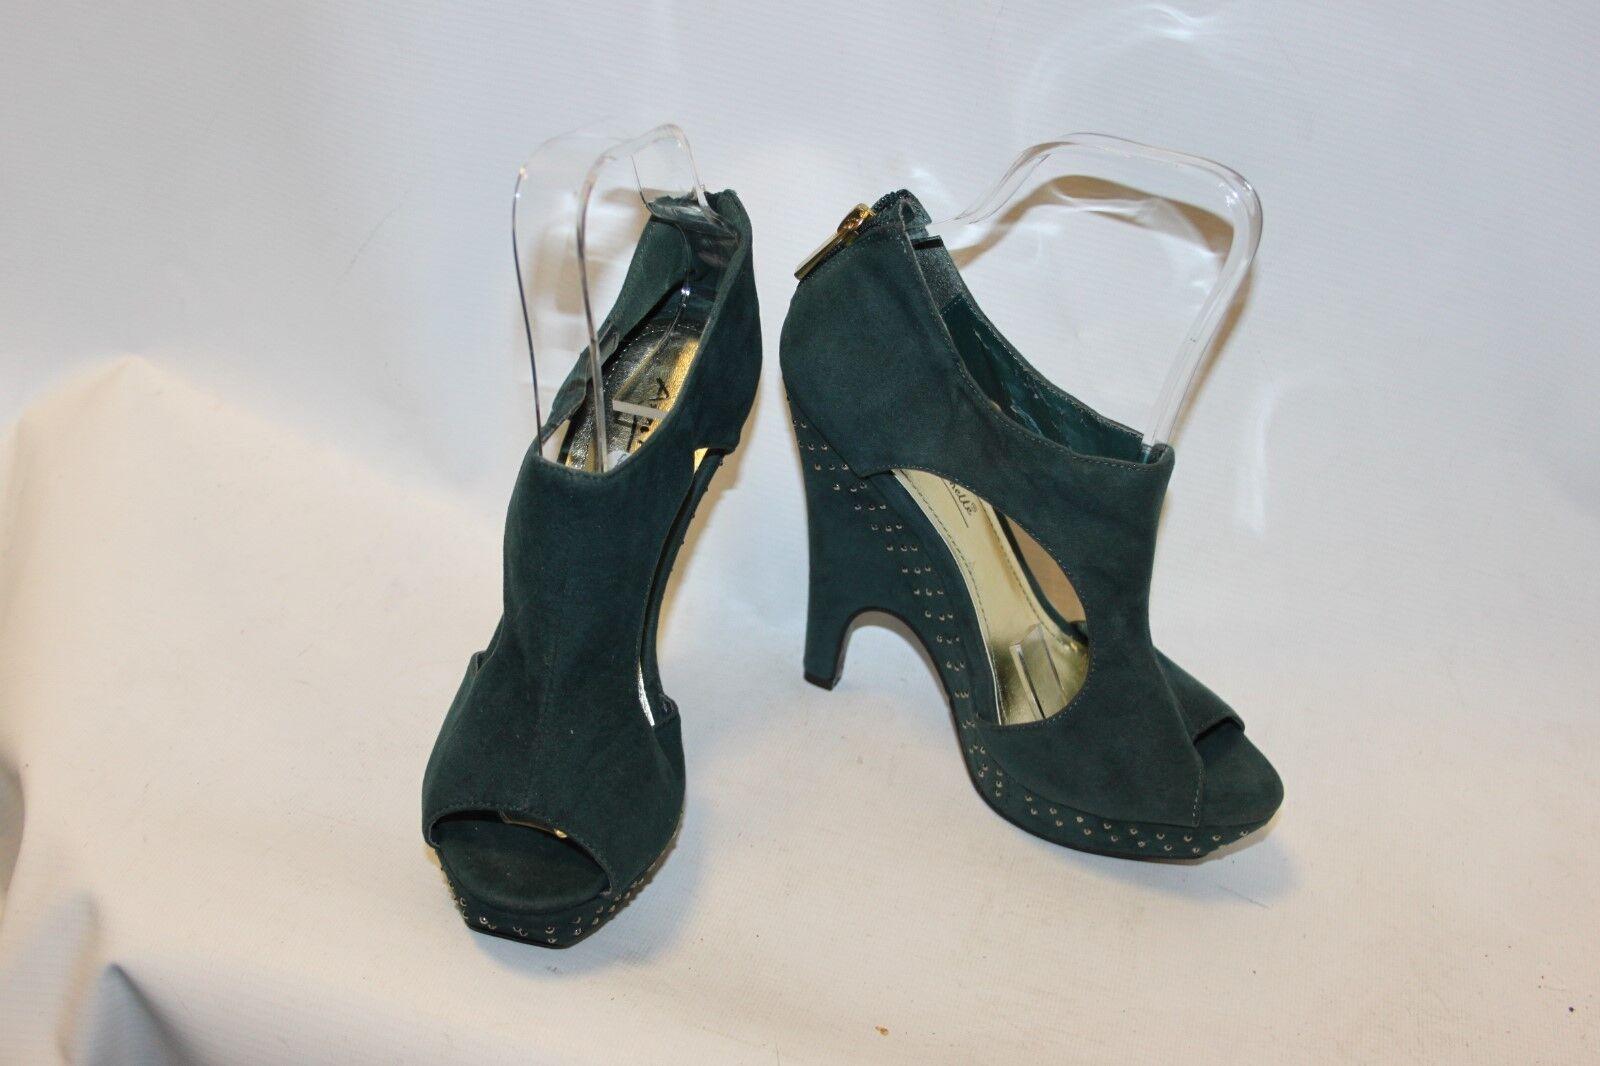 Moda jest prosta i niedroga Ladies Green Studded High Heel Shoes Size 36 UK Anne Michelle